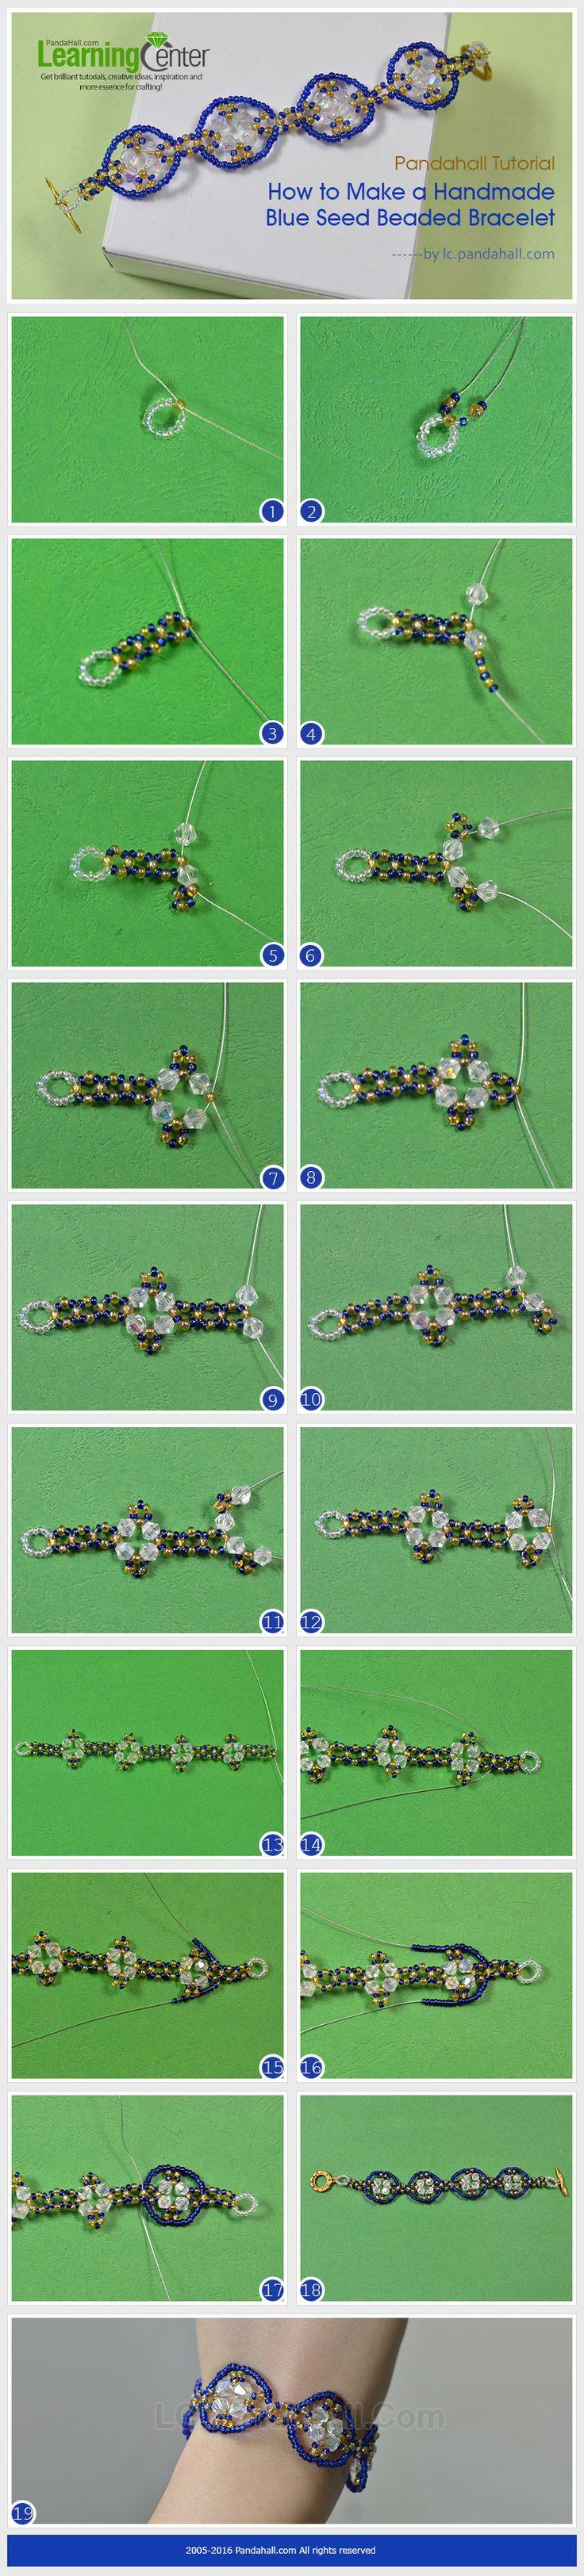 Tutorial on How to Make a Handmade Blue Seed Beaded Bracelet from LC.Pandahall.com